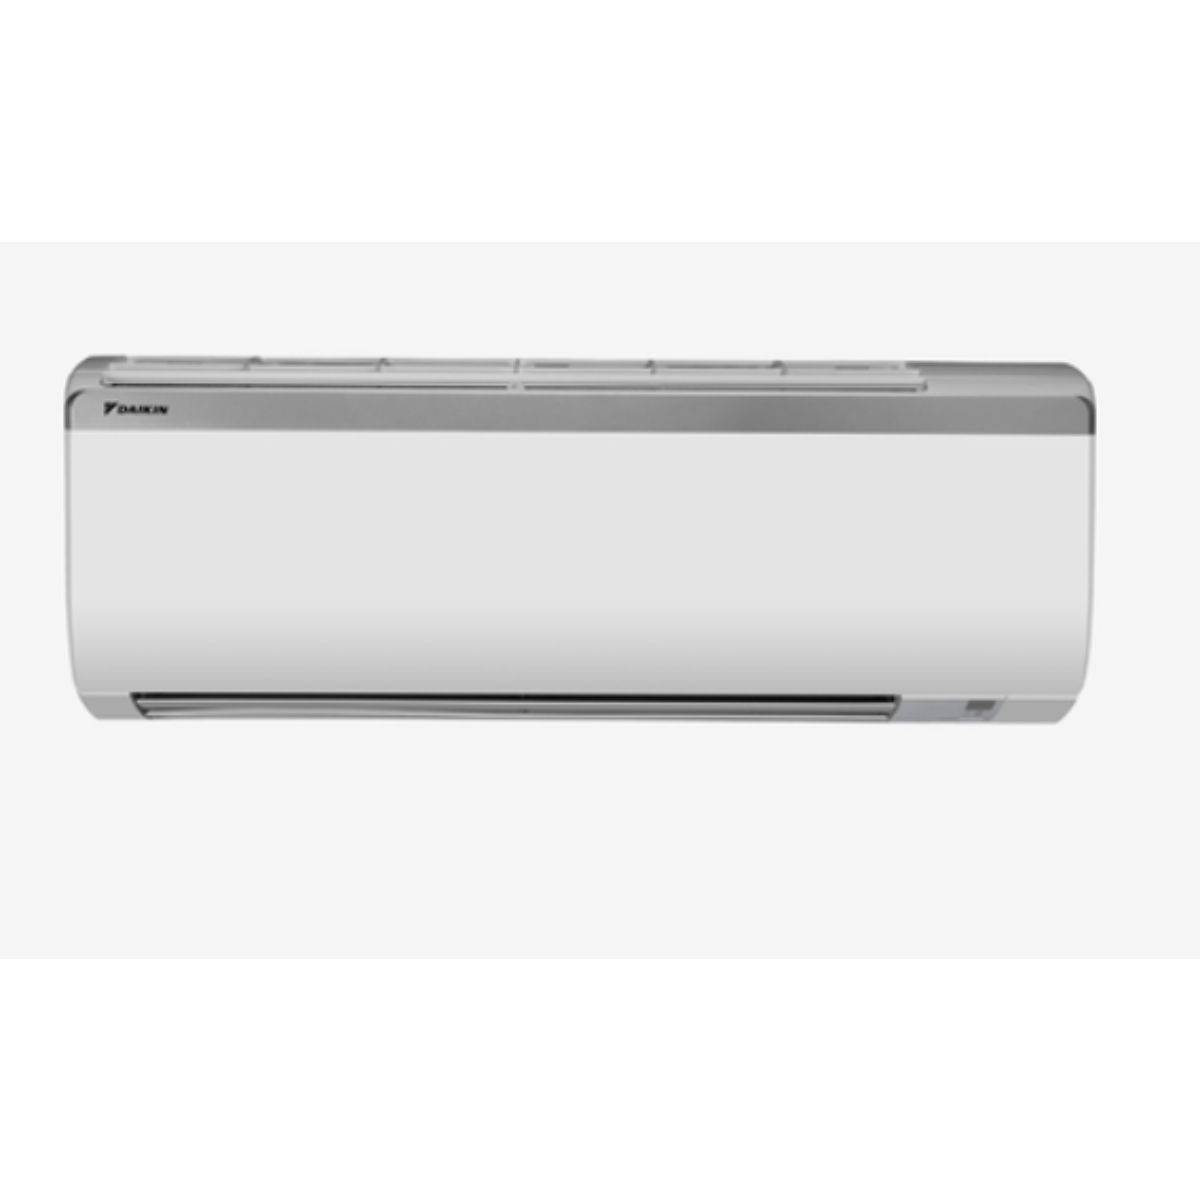 Daikin 1.5 Ton 3 Star Split Air Conditioner (MTL50TV)